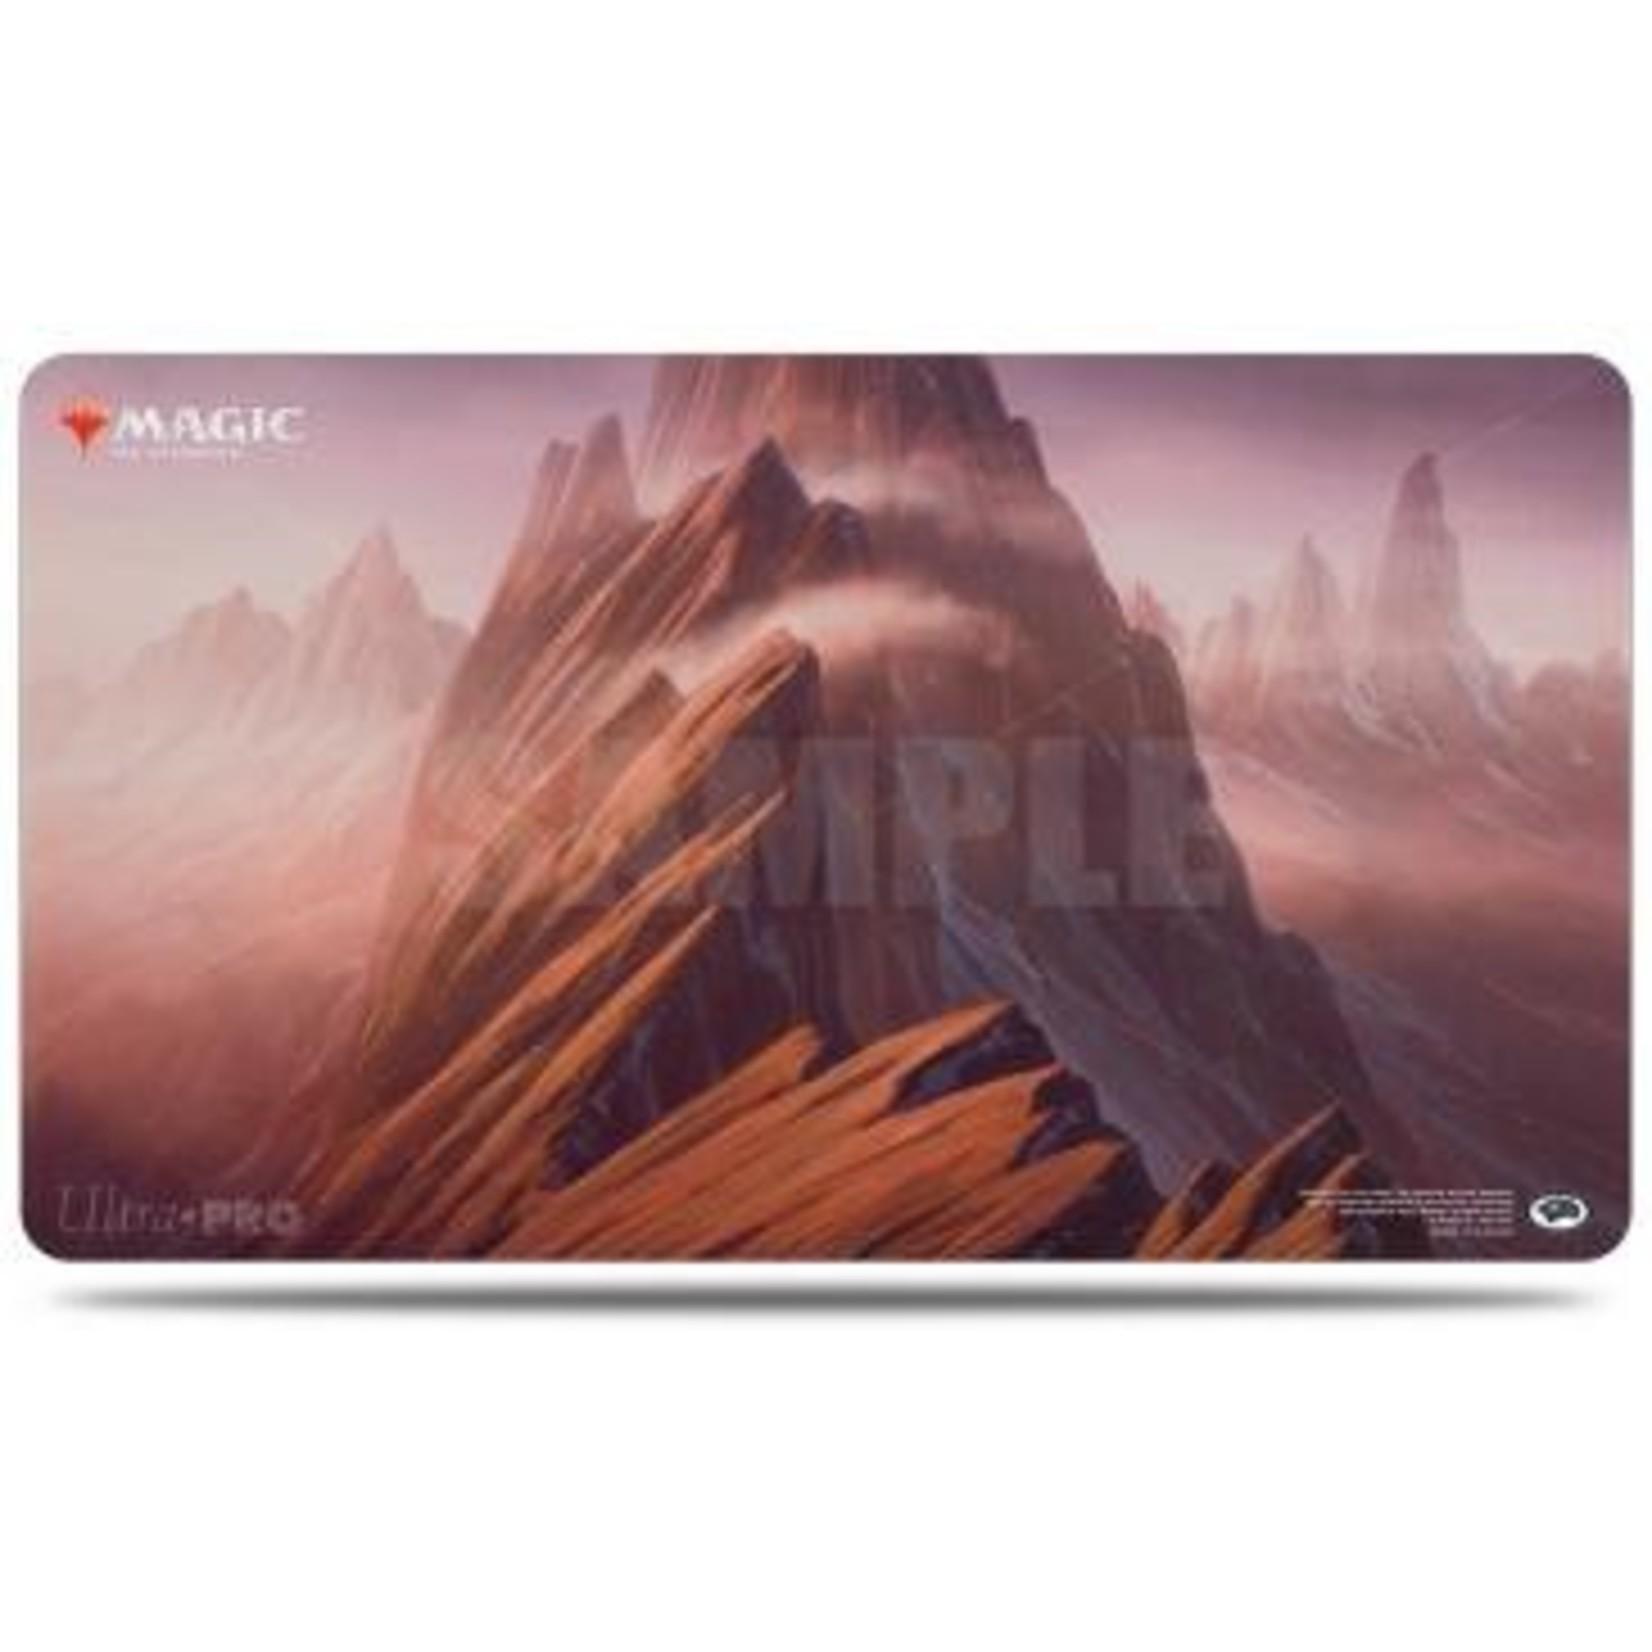 Ultra Pro Ultra Pro: Playmat - Unstable Mountain